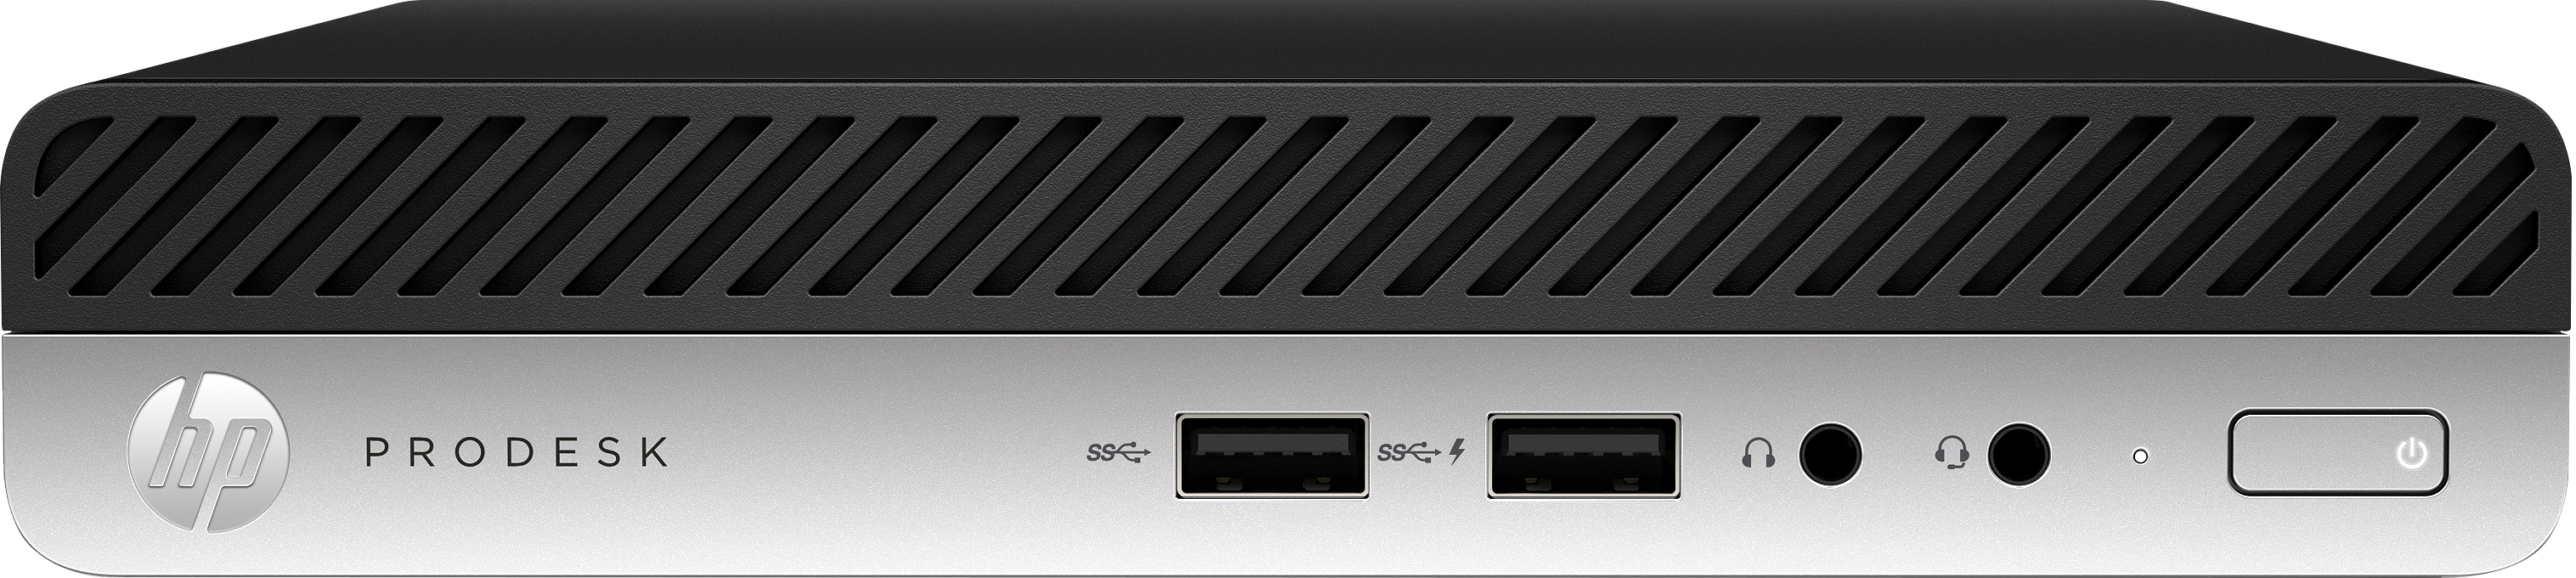 HP PRODESK 400 G5 - Komplettsystem - Core i7 2 GHz - RAM: 16 GB DDR4 - HDD: 512 GB NVMe - UHD Graphics 600